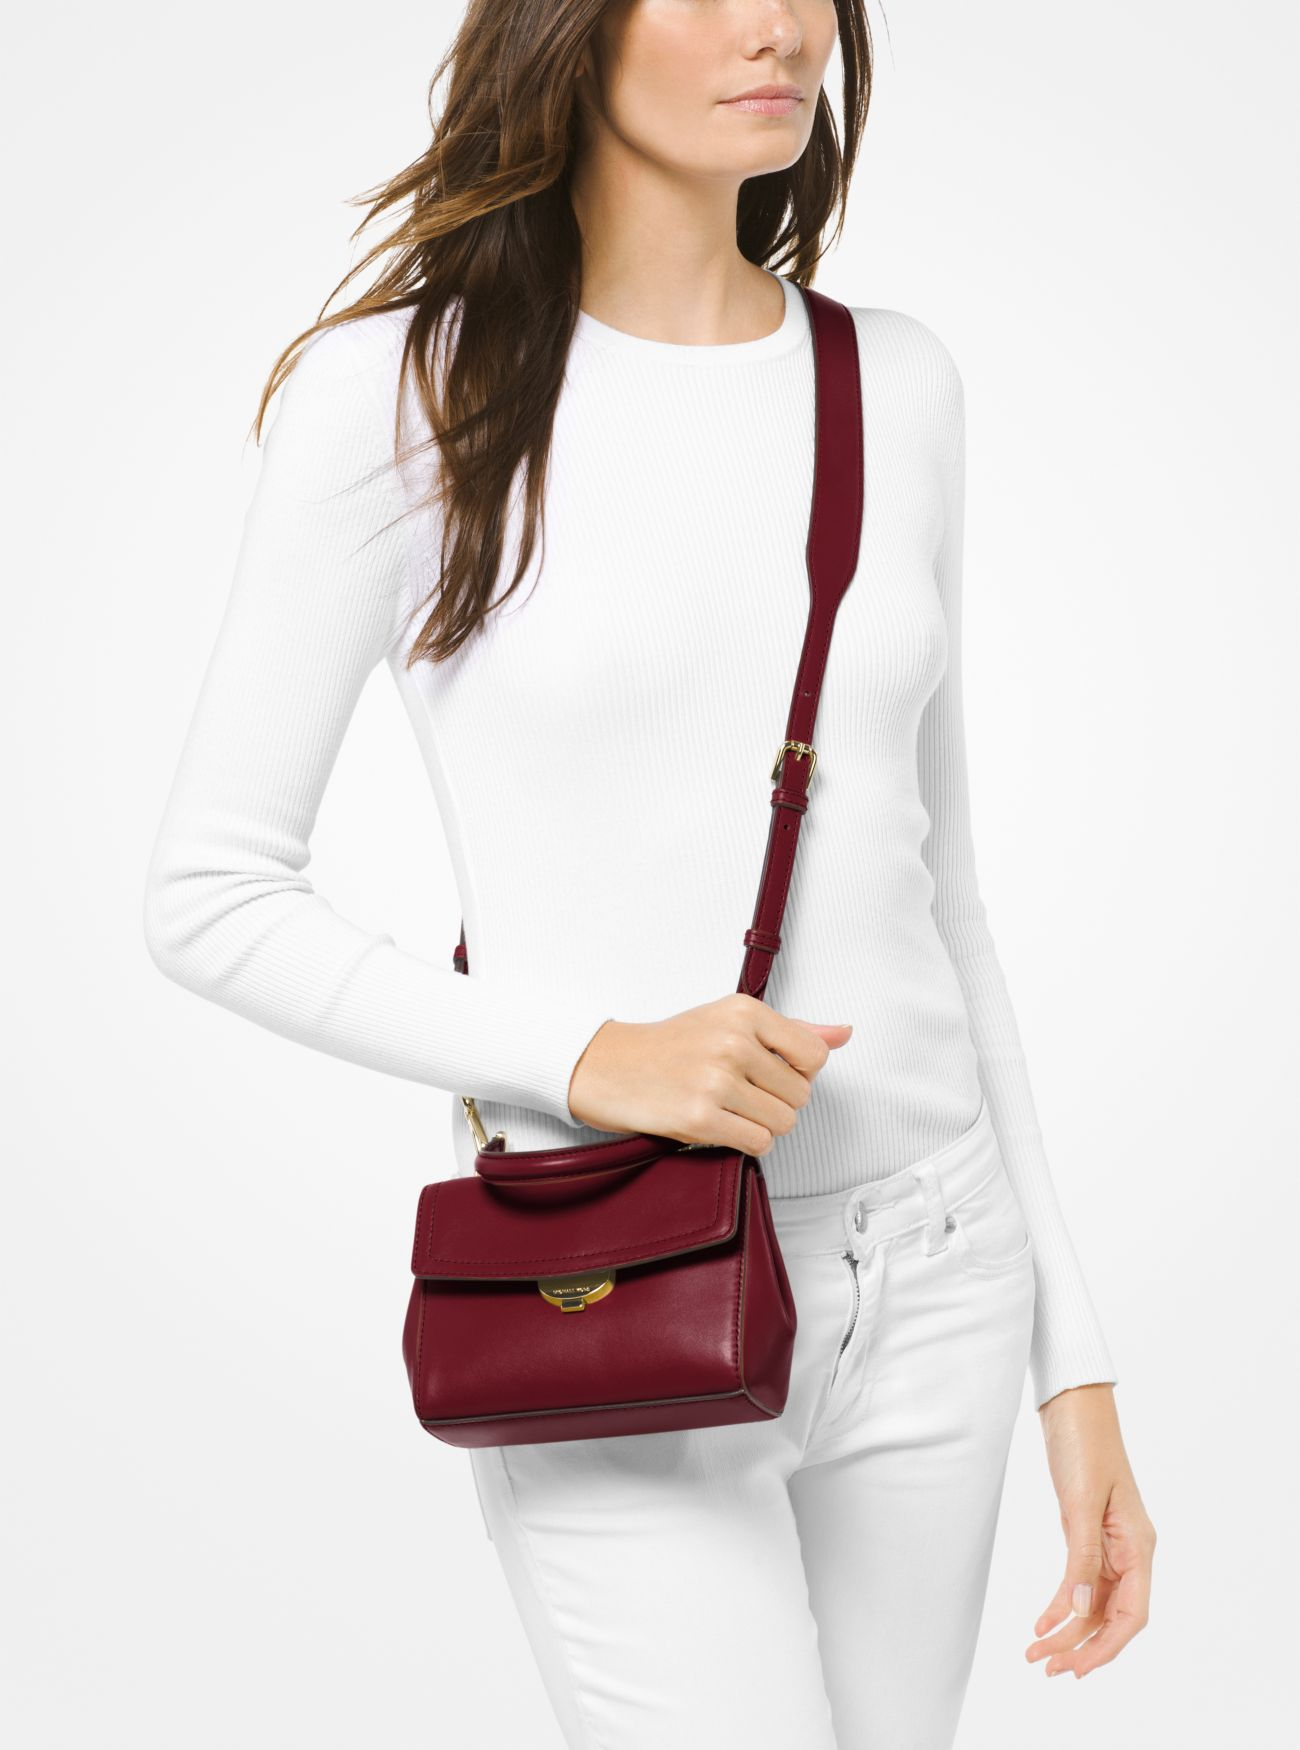 efefb045745e ... Ava Extra-Small Leather Crossbody Bag Ava Extra-Small Leather Crossbody  Bag. MICHAEL Michael Kors